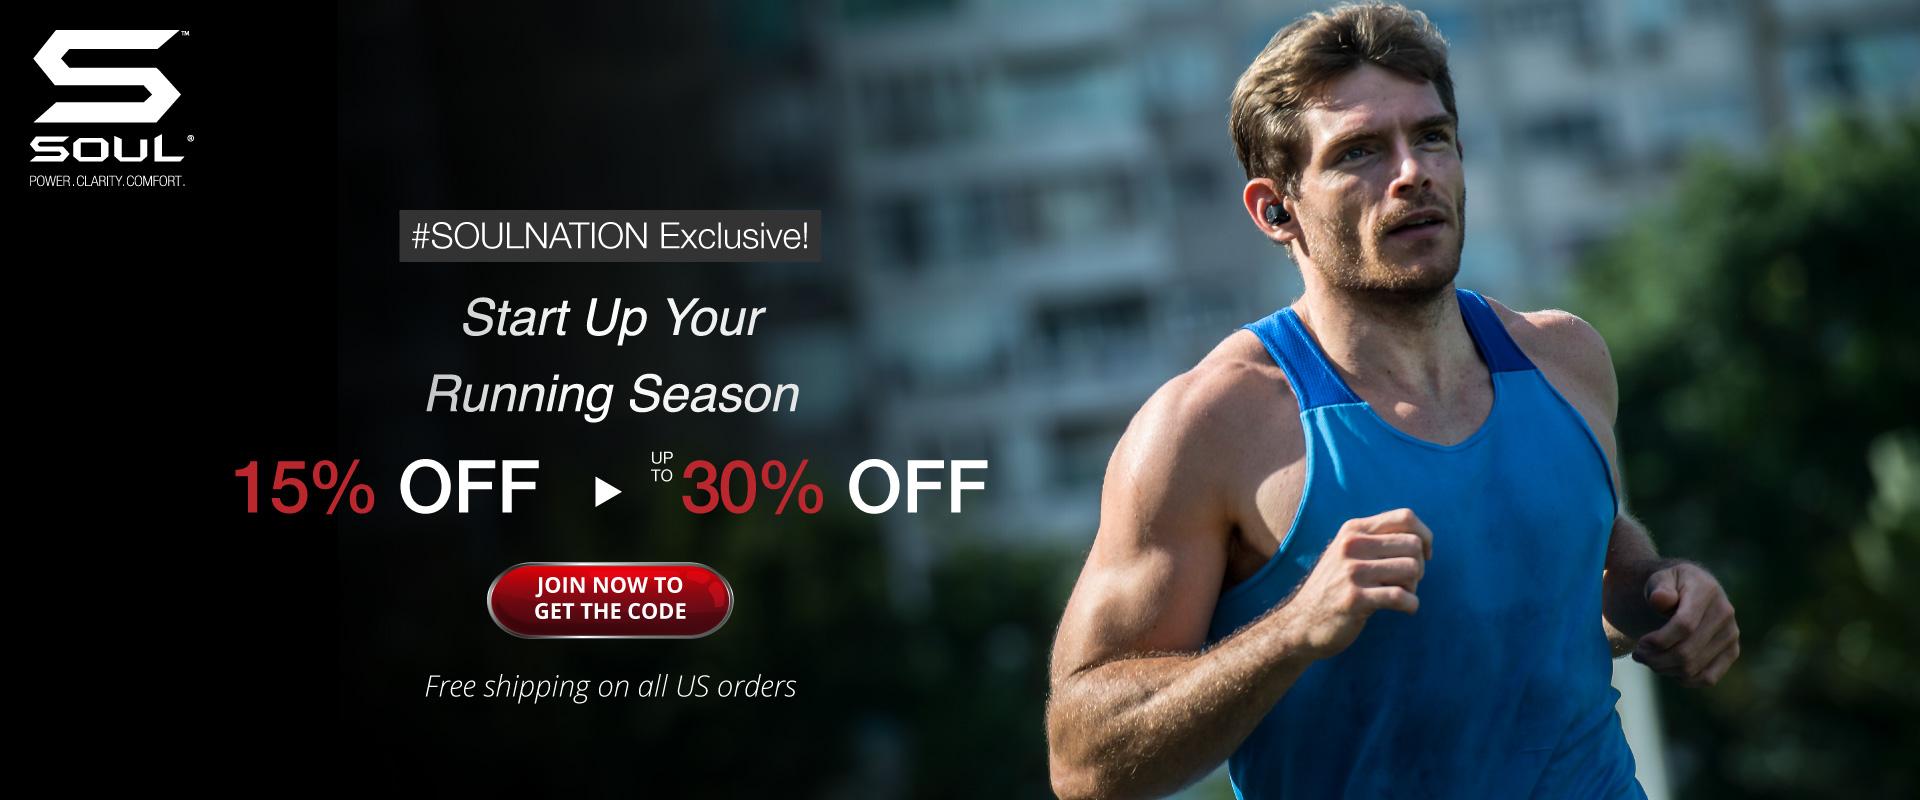 Soul Electronics - Start up your running season